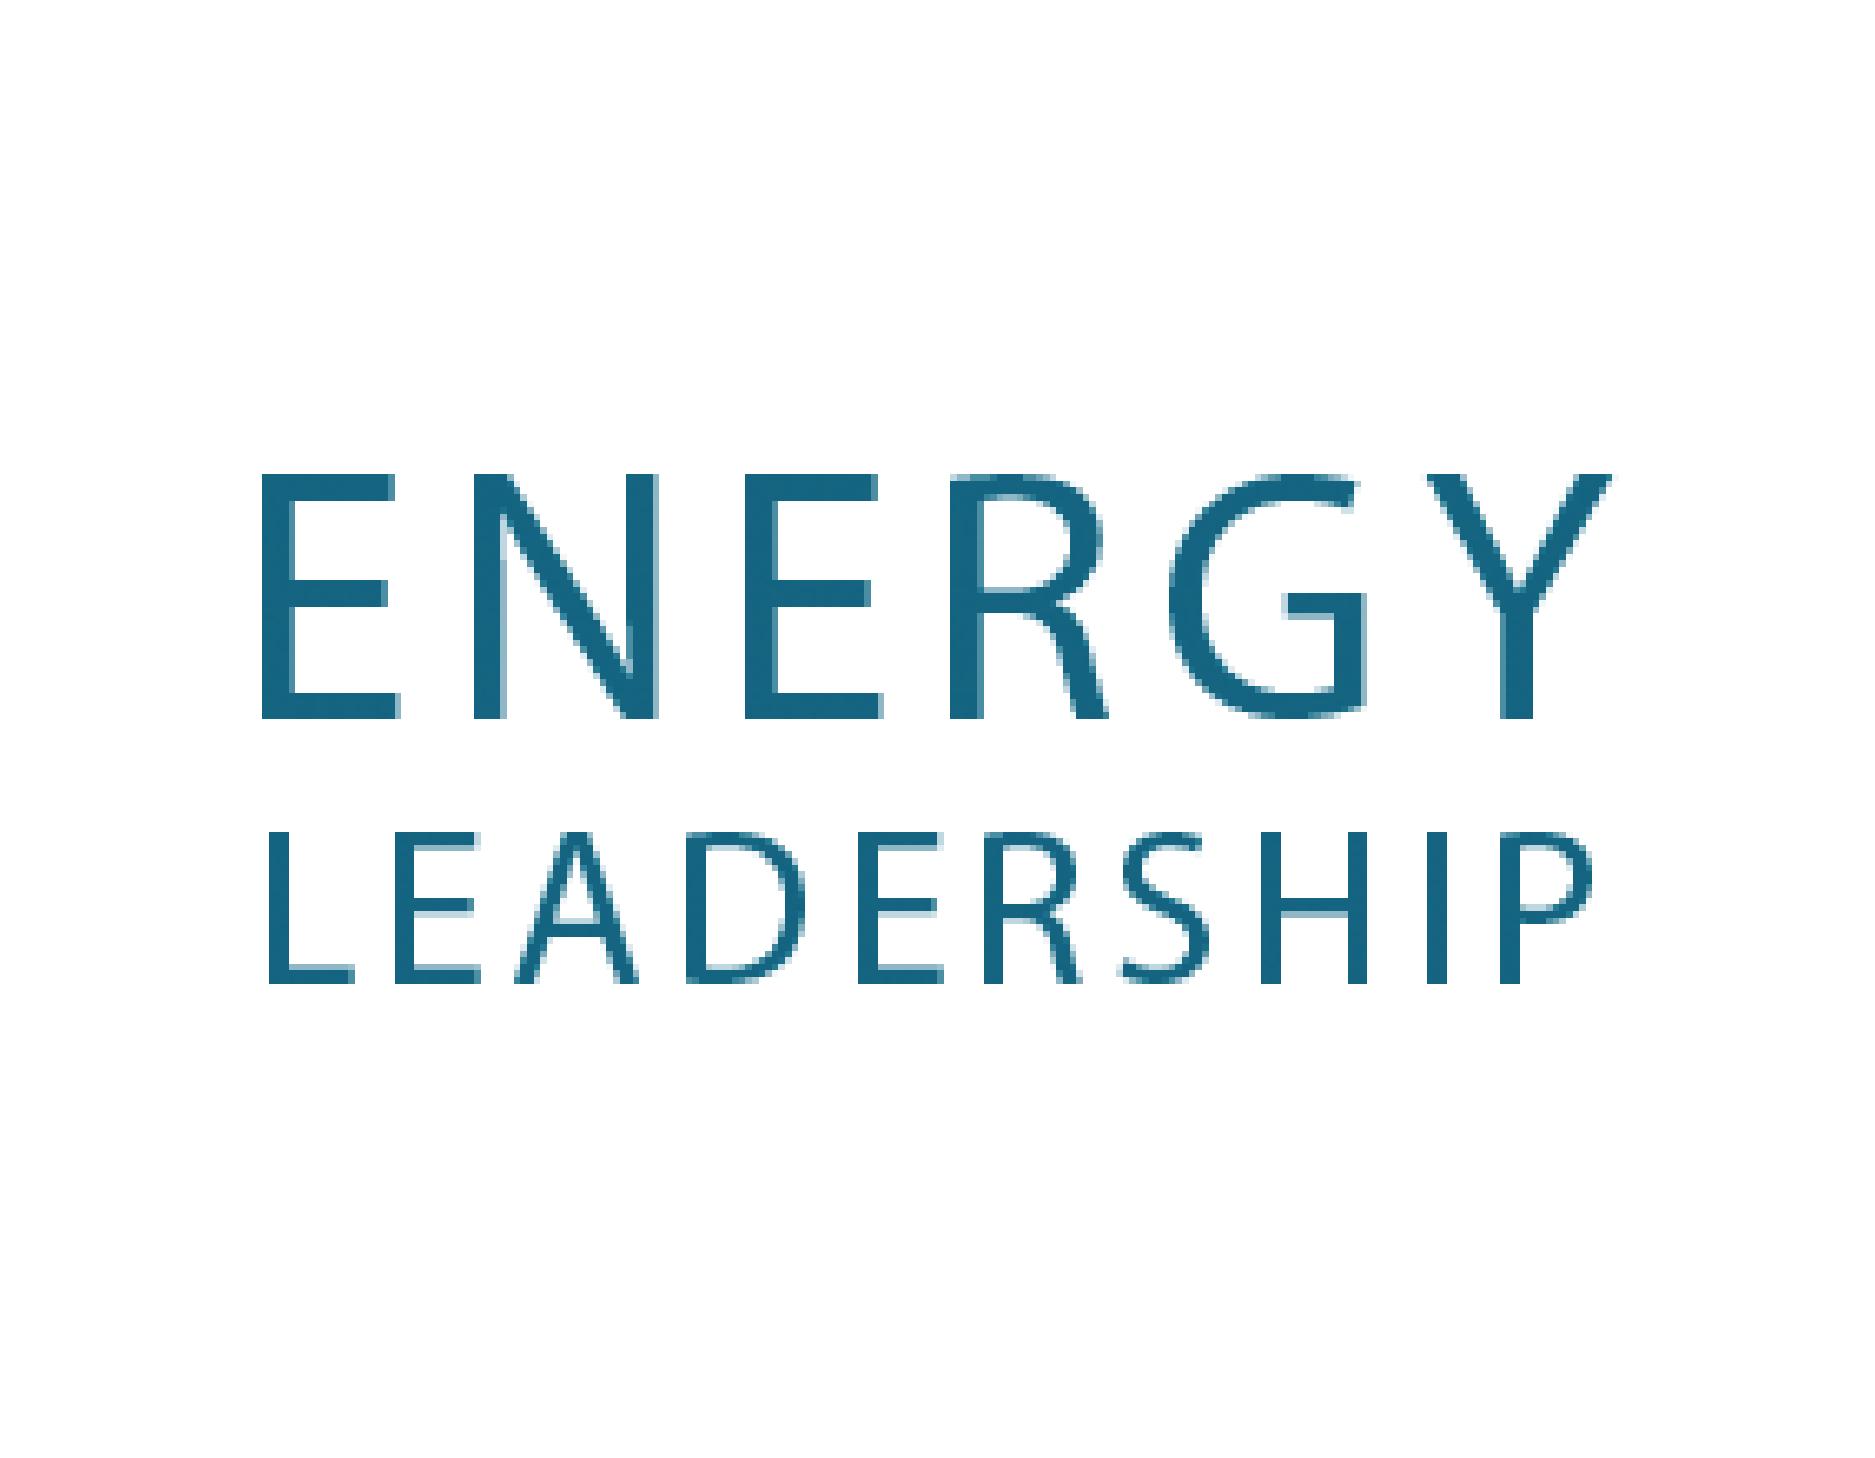 Coaching Credentail Logos 2_Energy Leadership.png